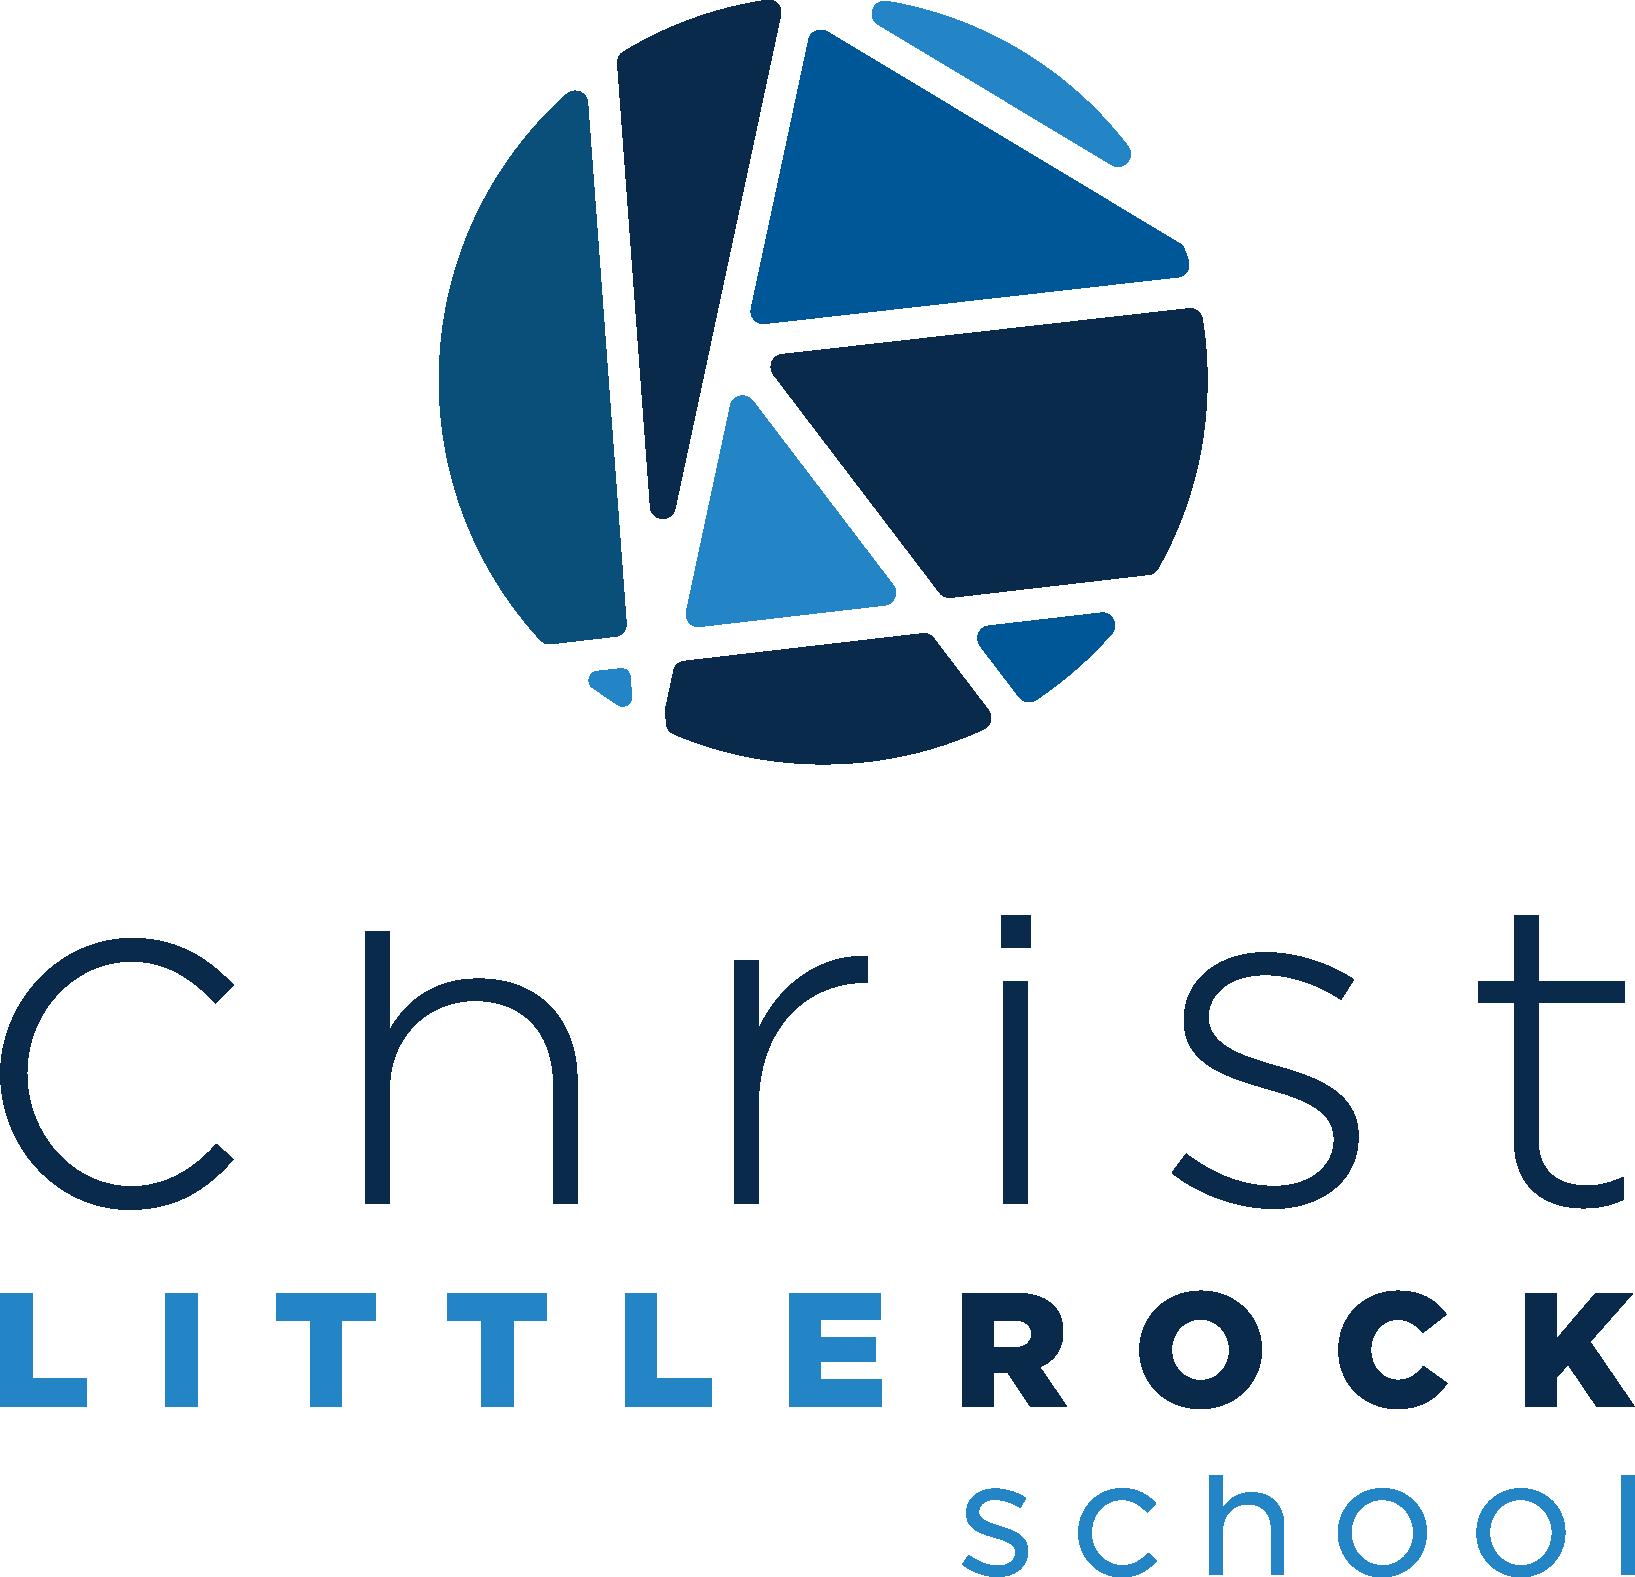 CLR Logos 2019_21 School Full.png